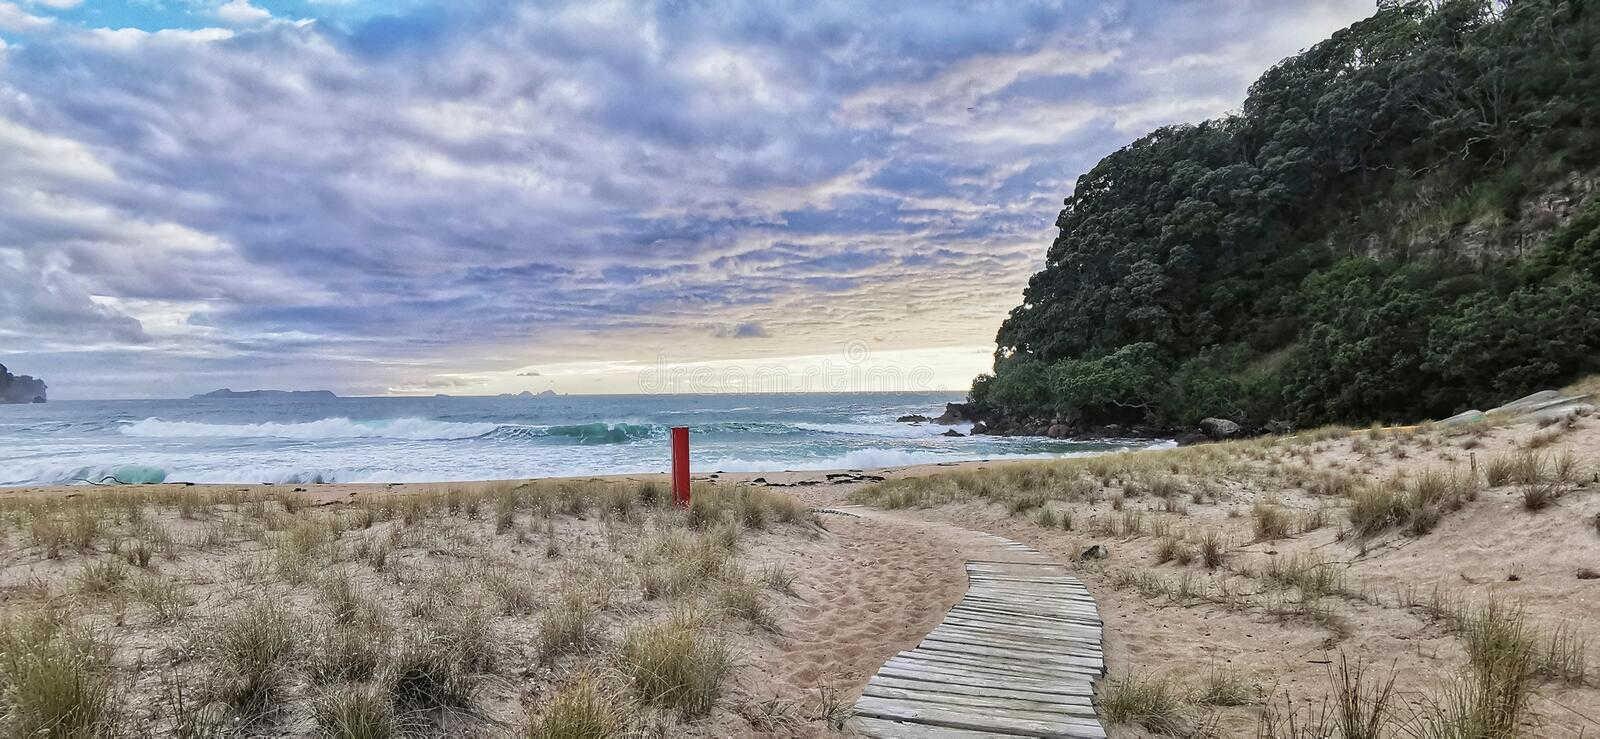 Onemana Beach,New Zealand @Blagov58